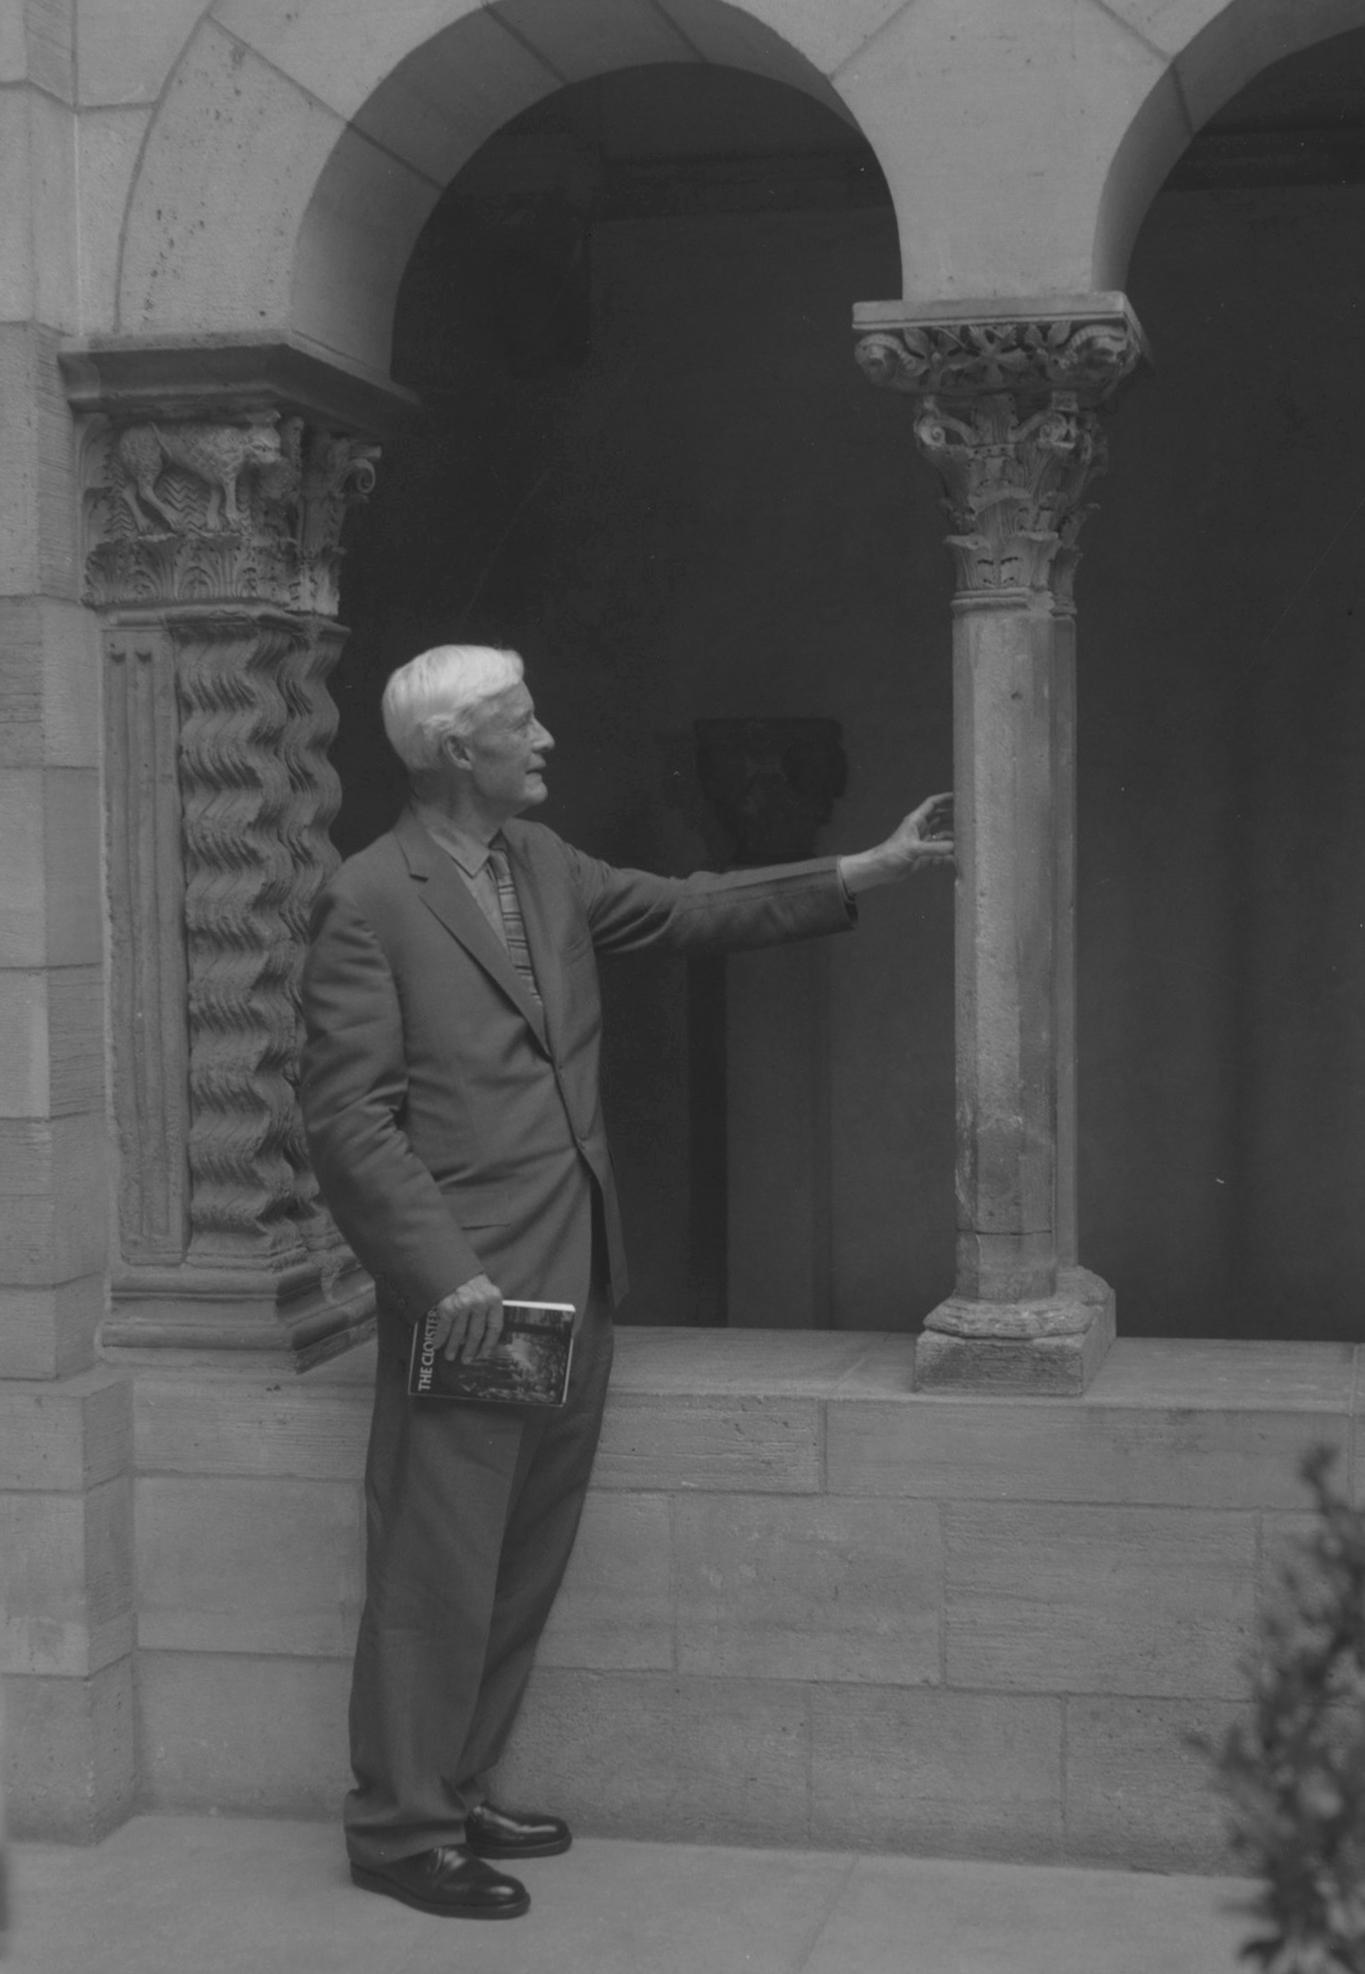 Figure 9: Raymond Pitcairn admiring a column at The Cloisters.